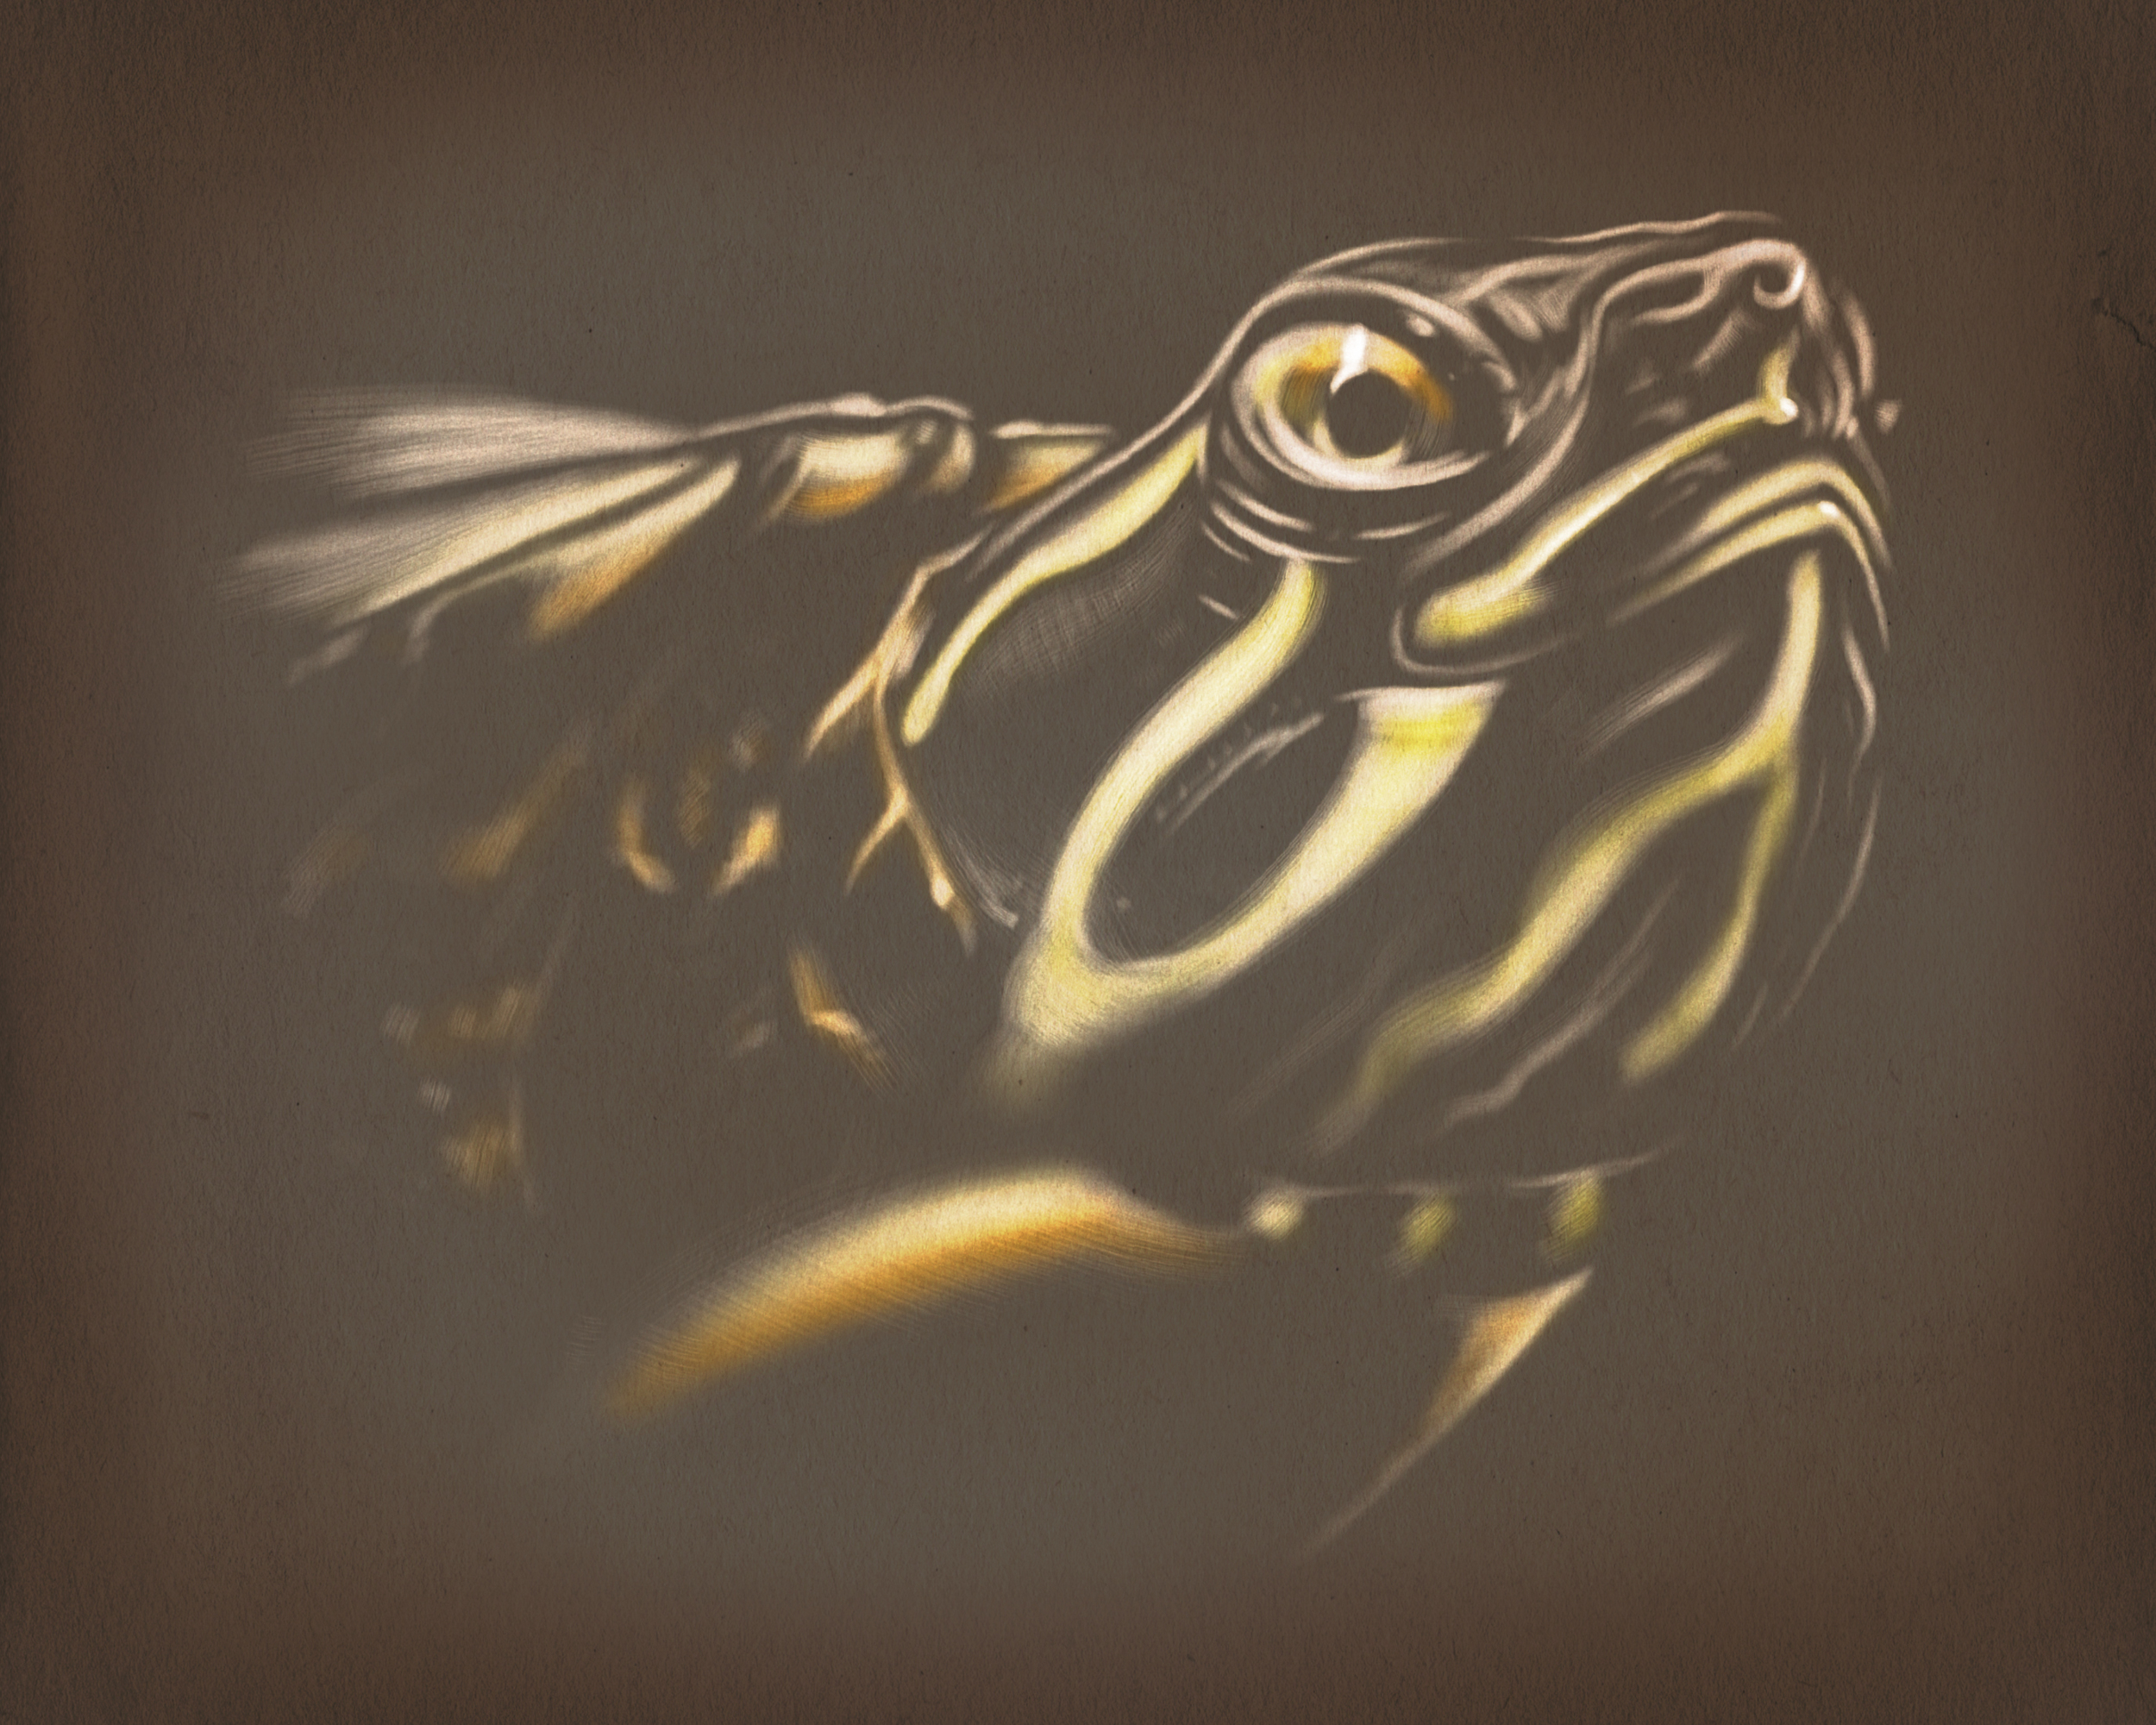 Oviatt the turtle